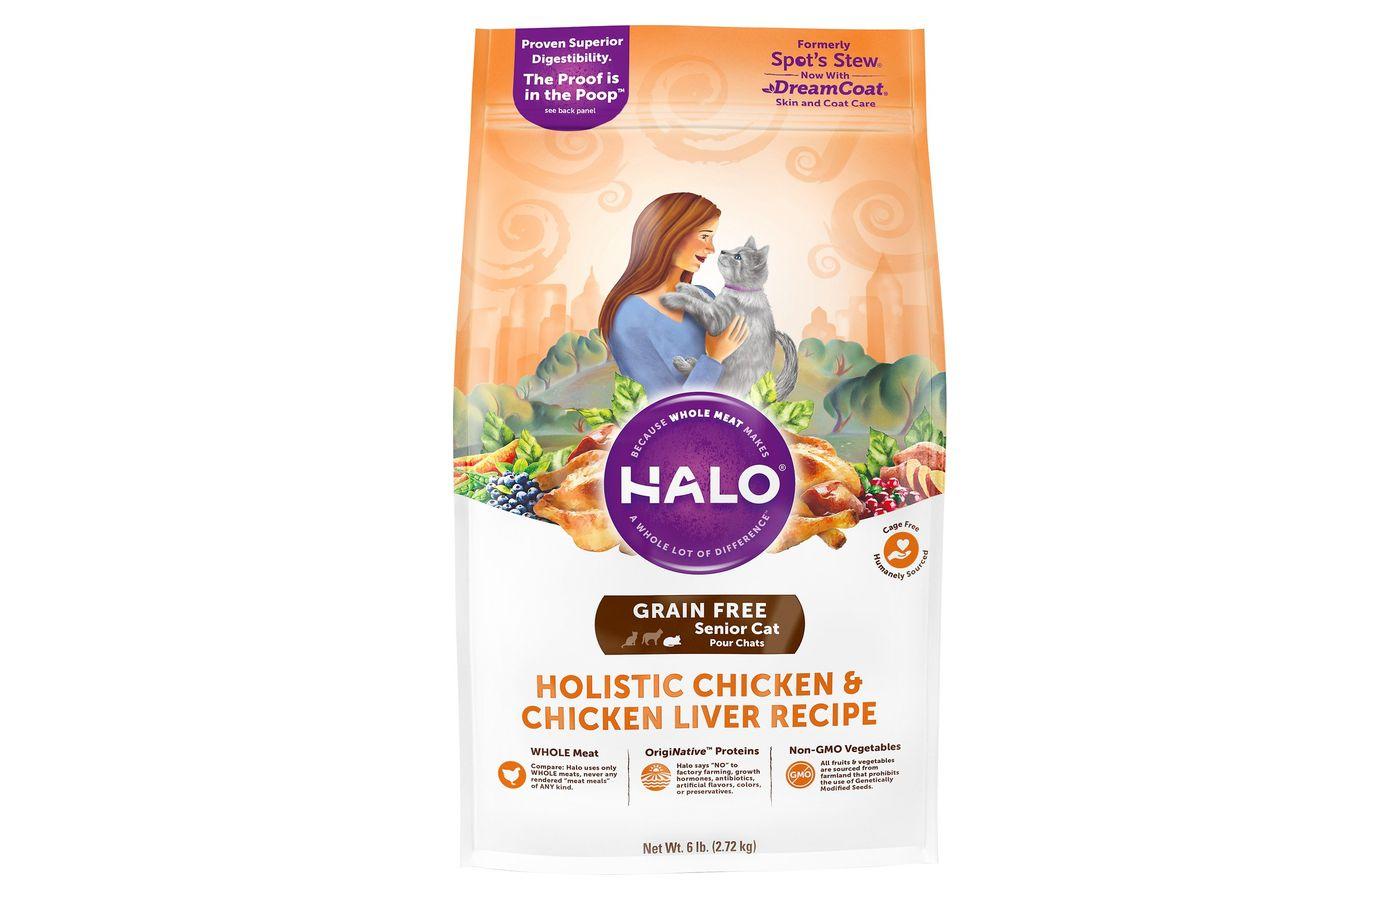 Halo Holistic Grain-Free Chicken and Chicken Liver Recipe for Senior Cats